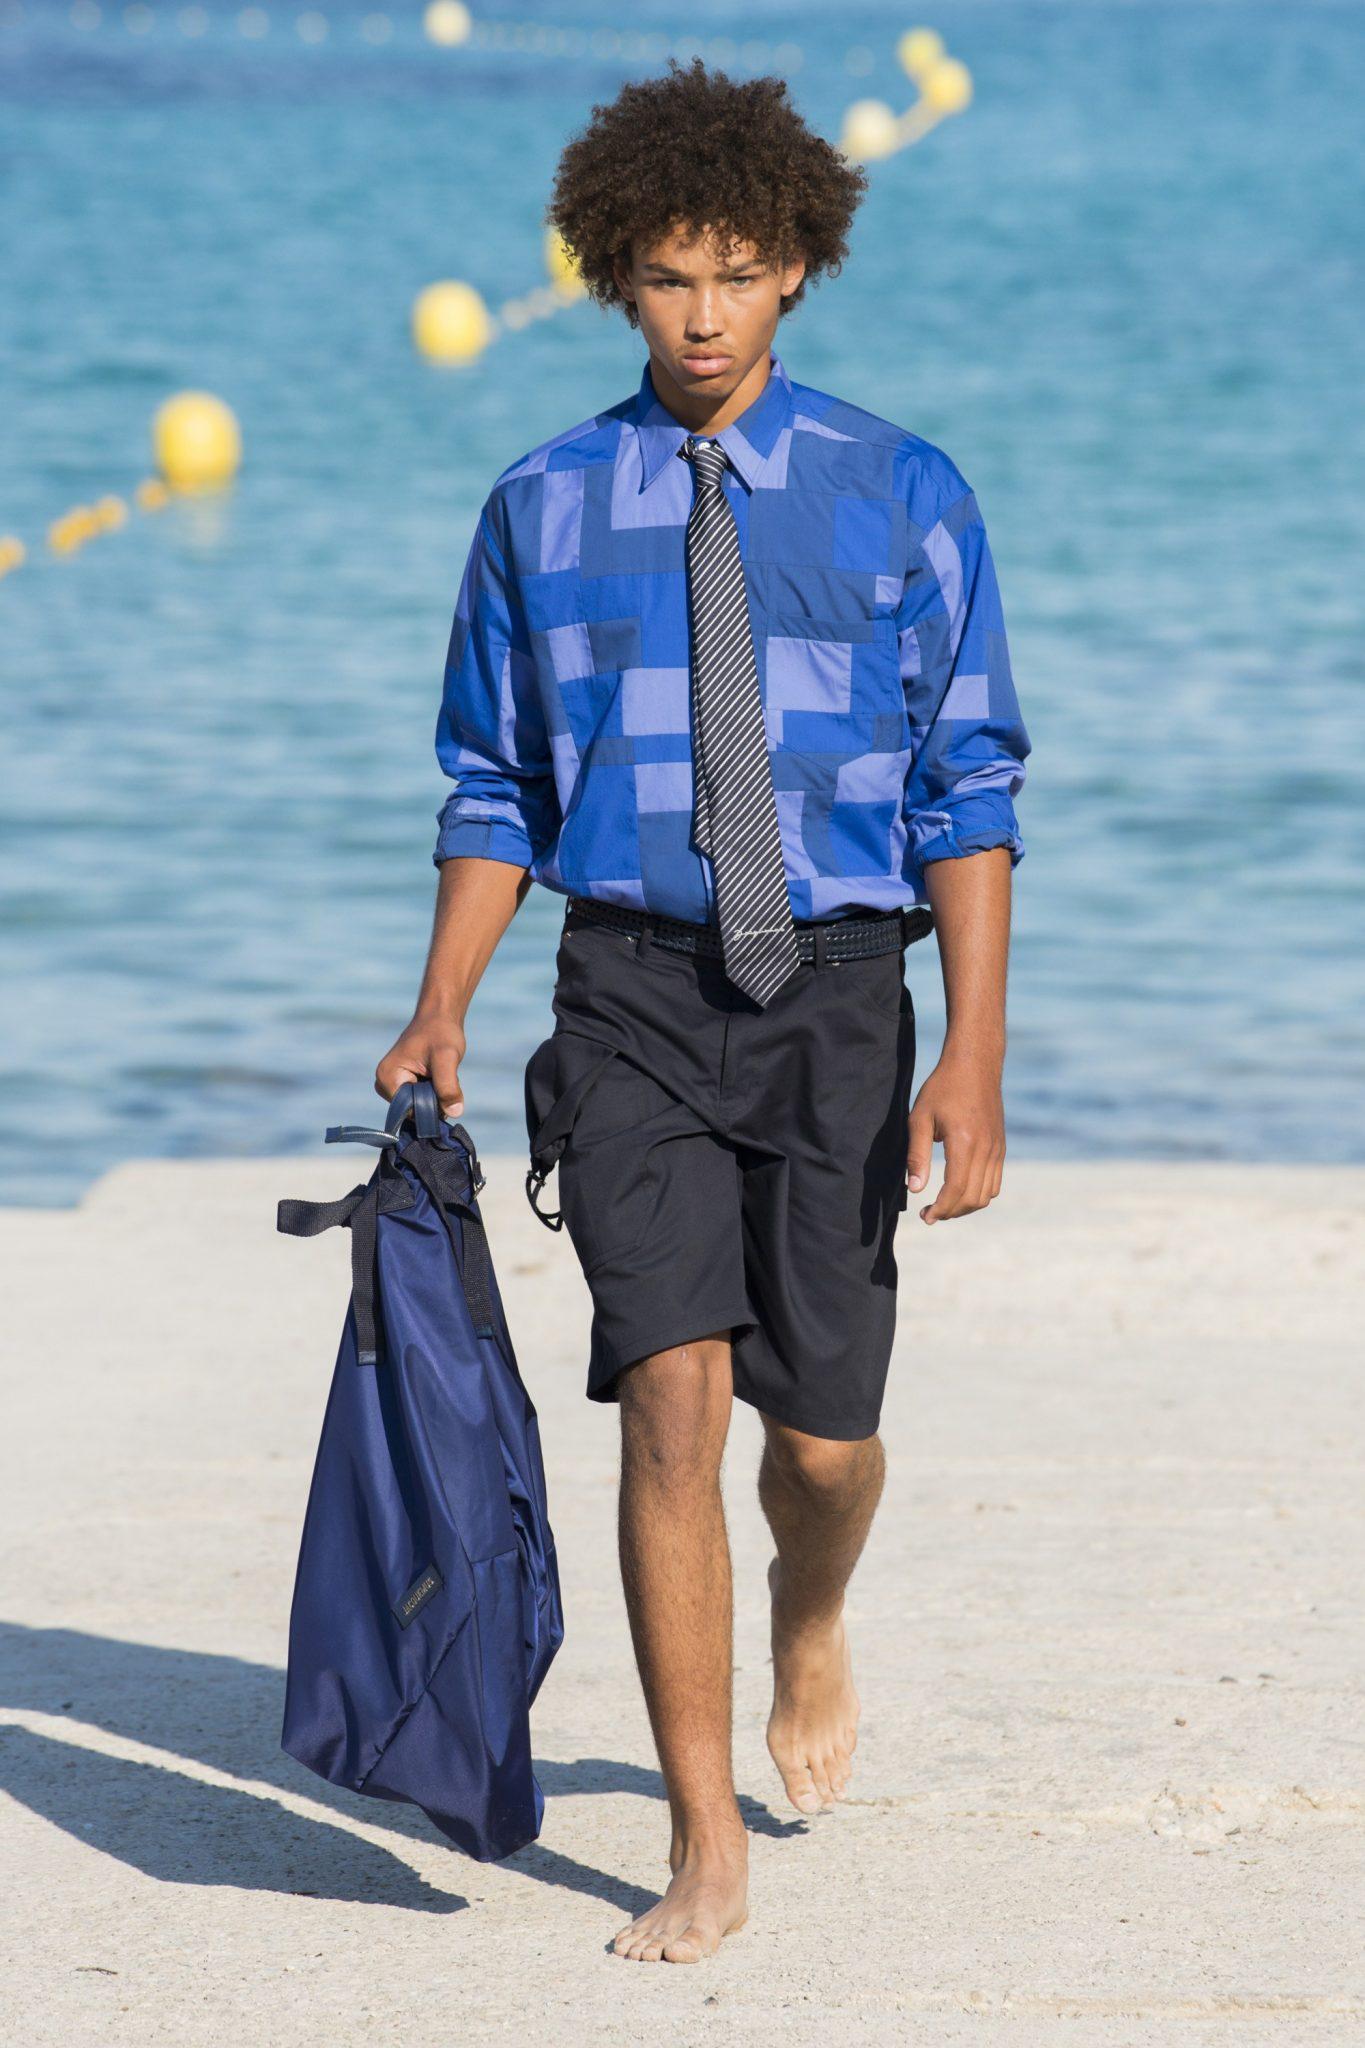 TENDENCIAS DEL OTOÑO 2018 moda masculina madmenmag